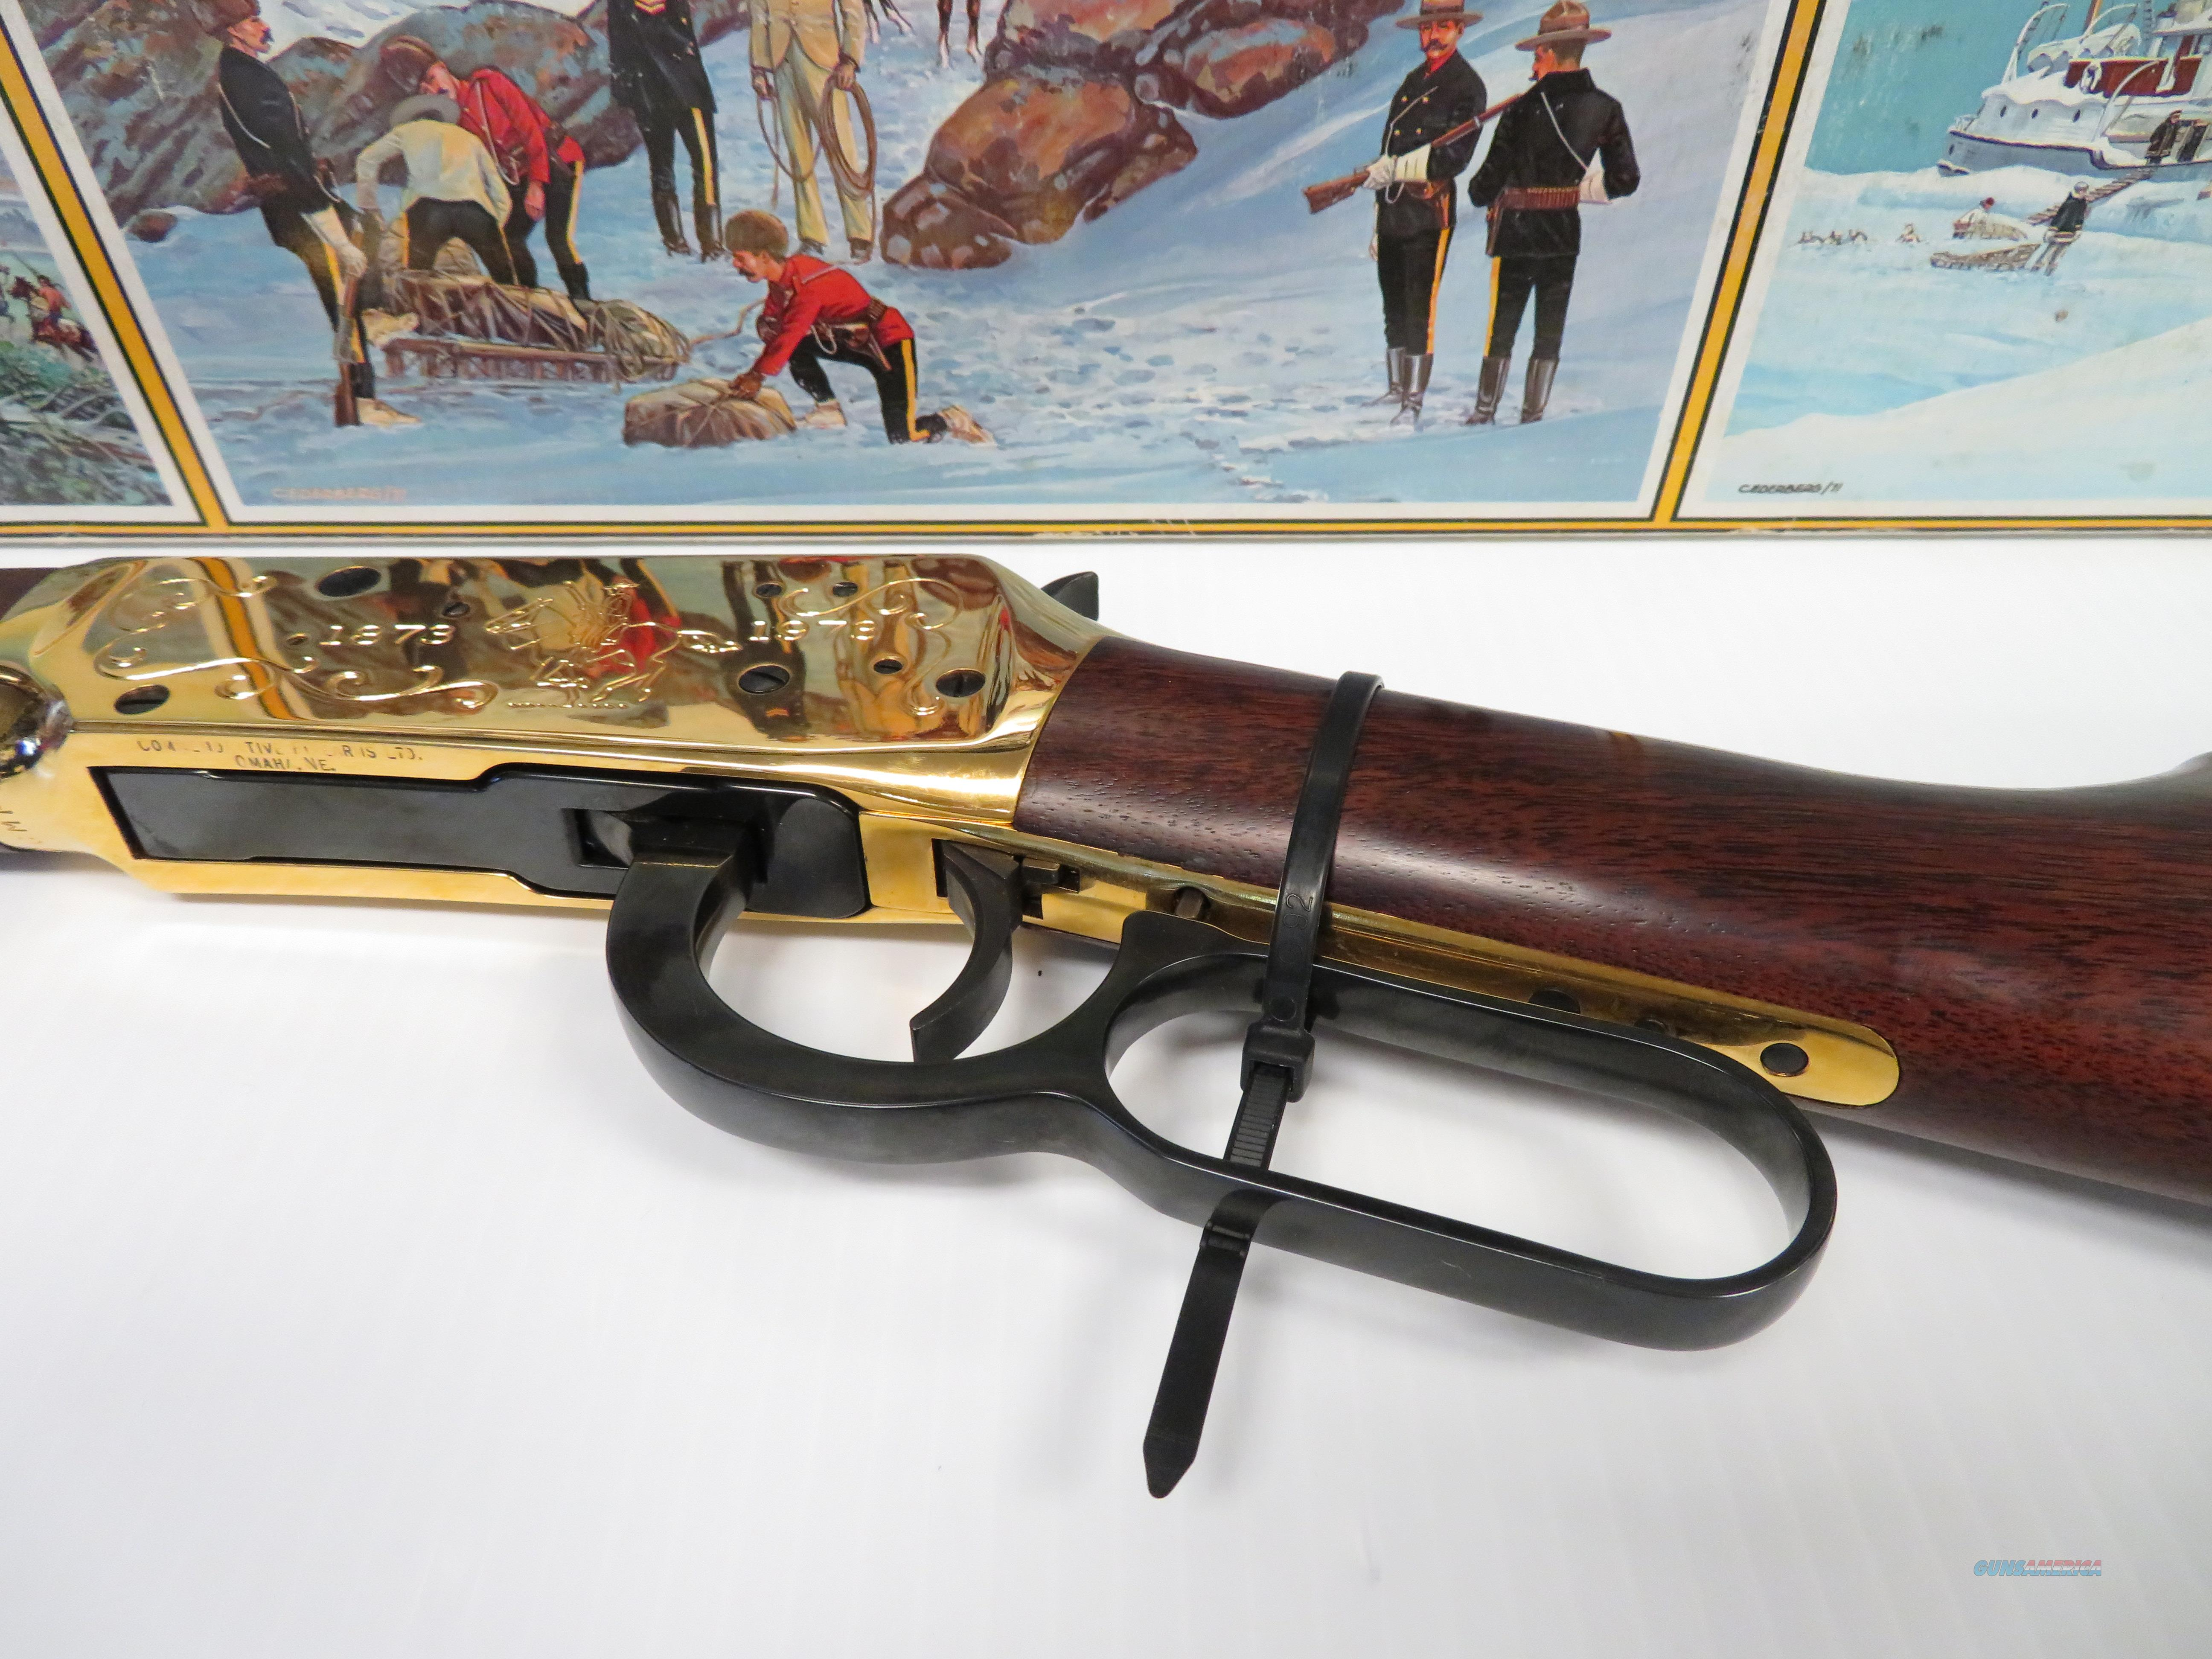 Winchester R C M P  Centennial Rifle 30-30 Model 94 Lever Action Rifle  G9464 22